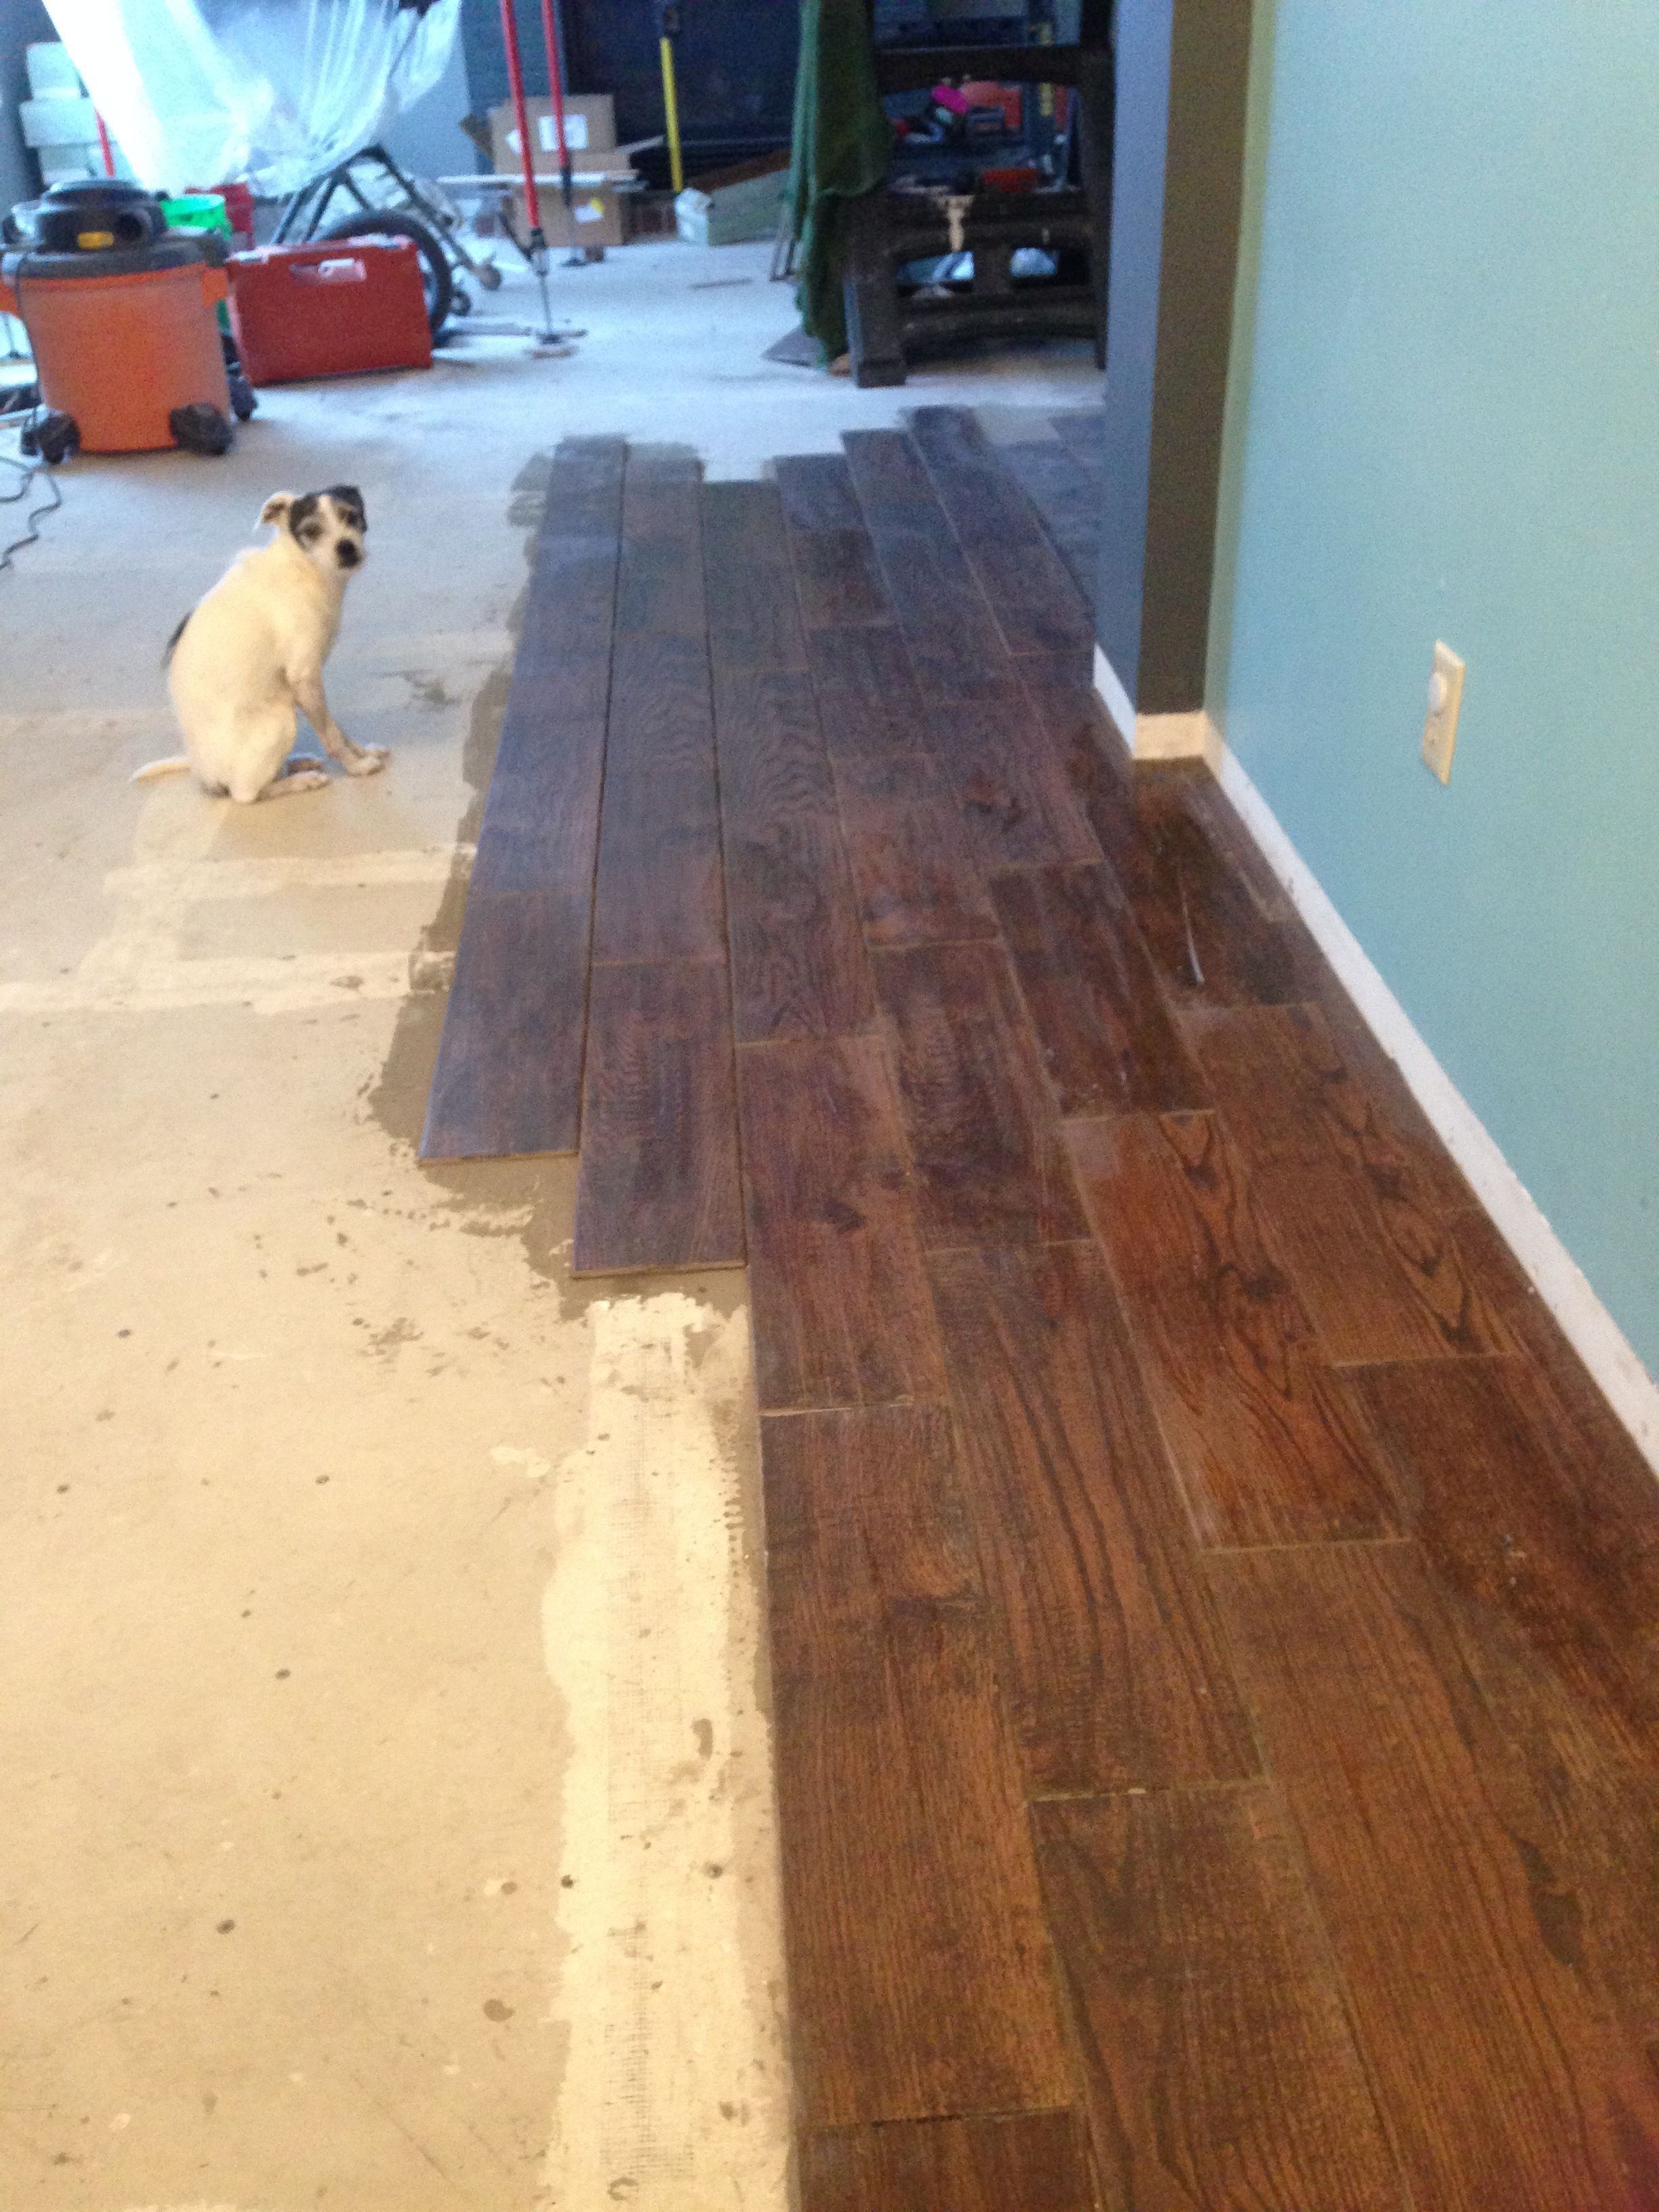 Ceramic tile that looks like hardwood floor and bruno ceramic tile that looks like hardwood floor and bruno doublecrazyfo Choice Image